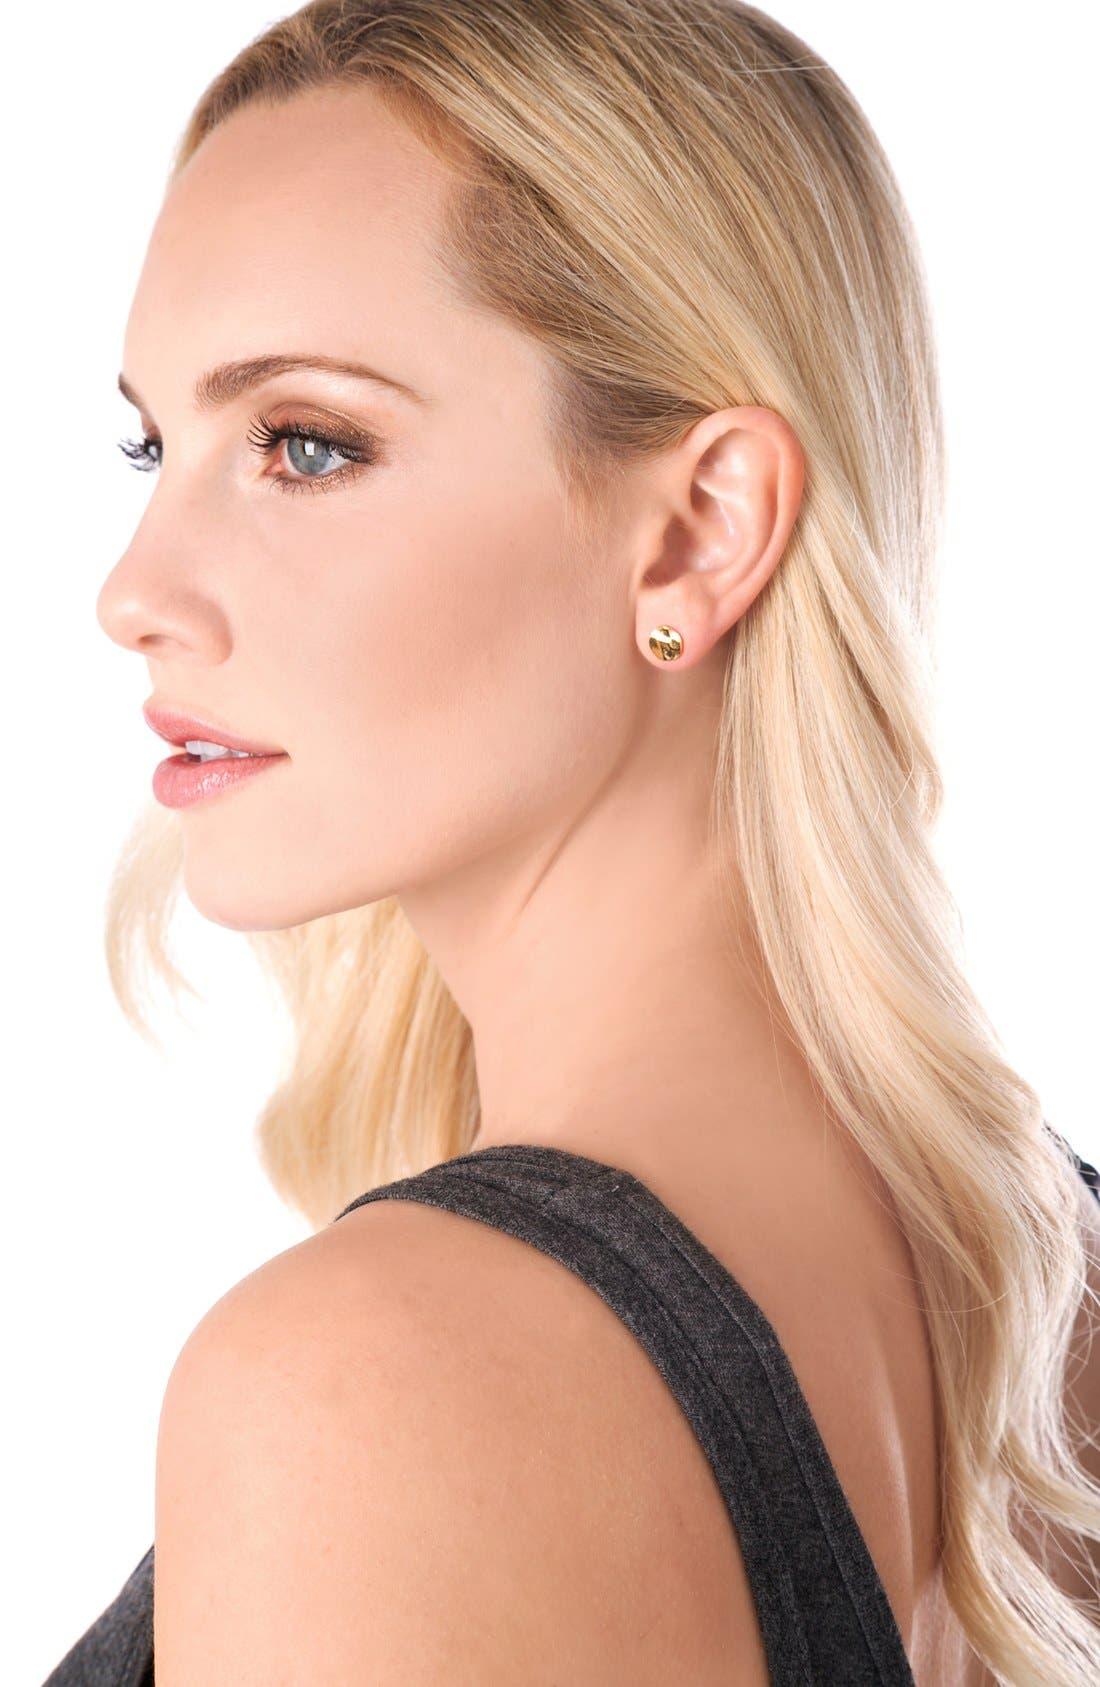 'Chloe' Small Stud Earrings,                             Alternate thumbnail 4, color,                             GOLD